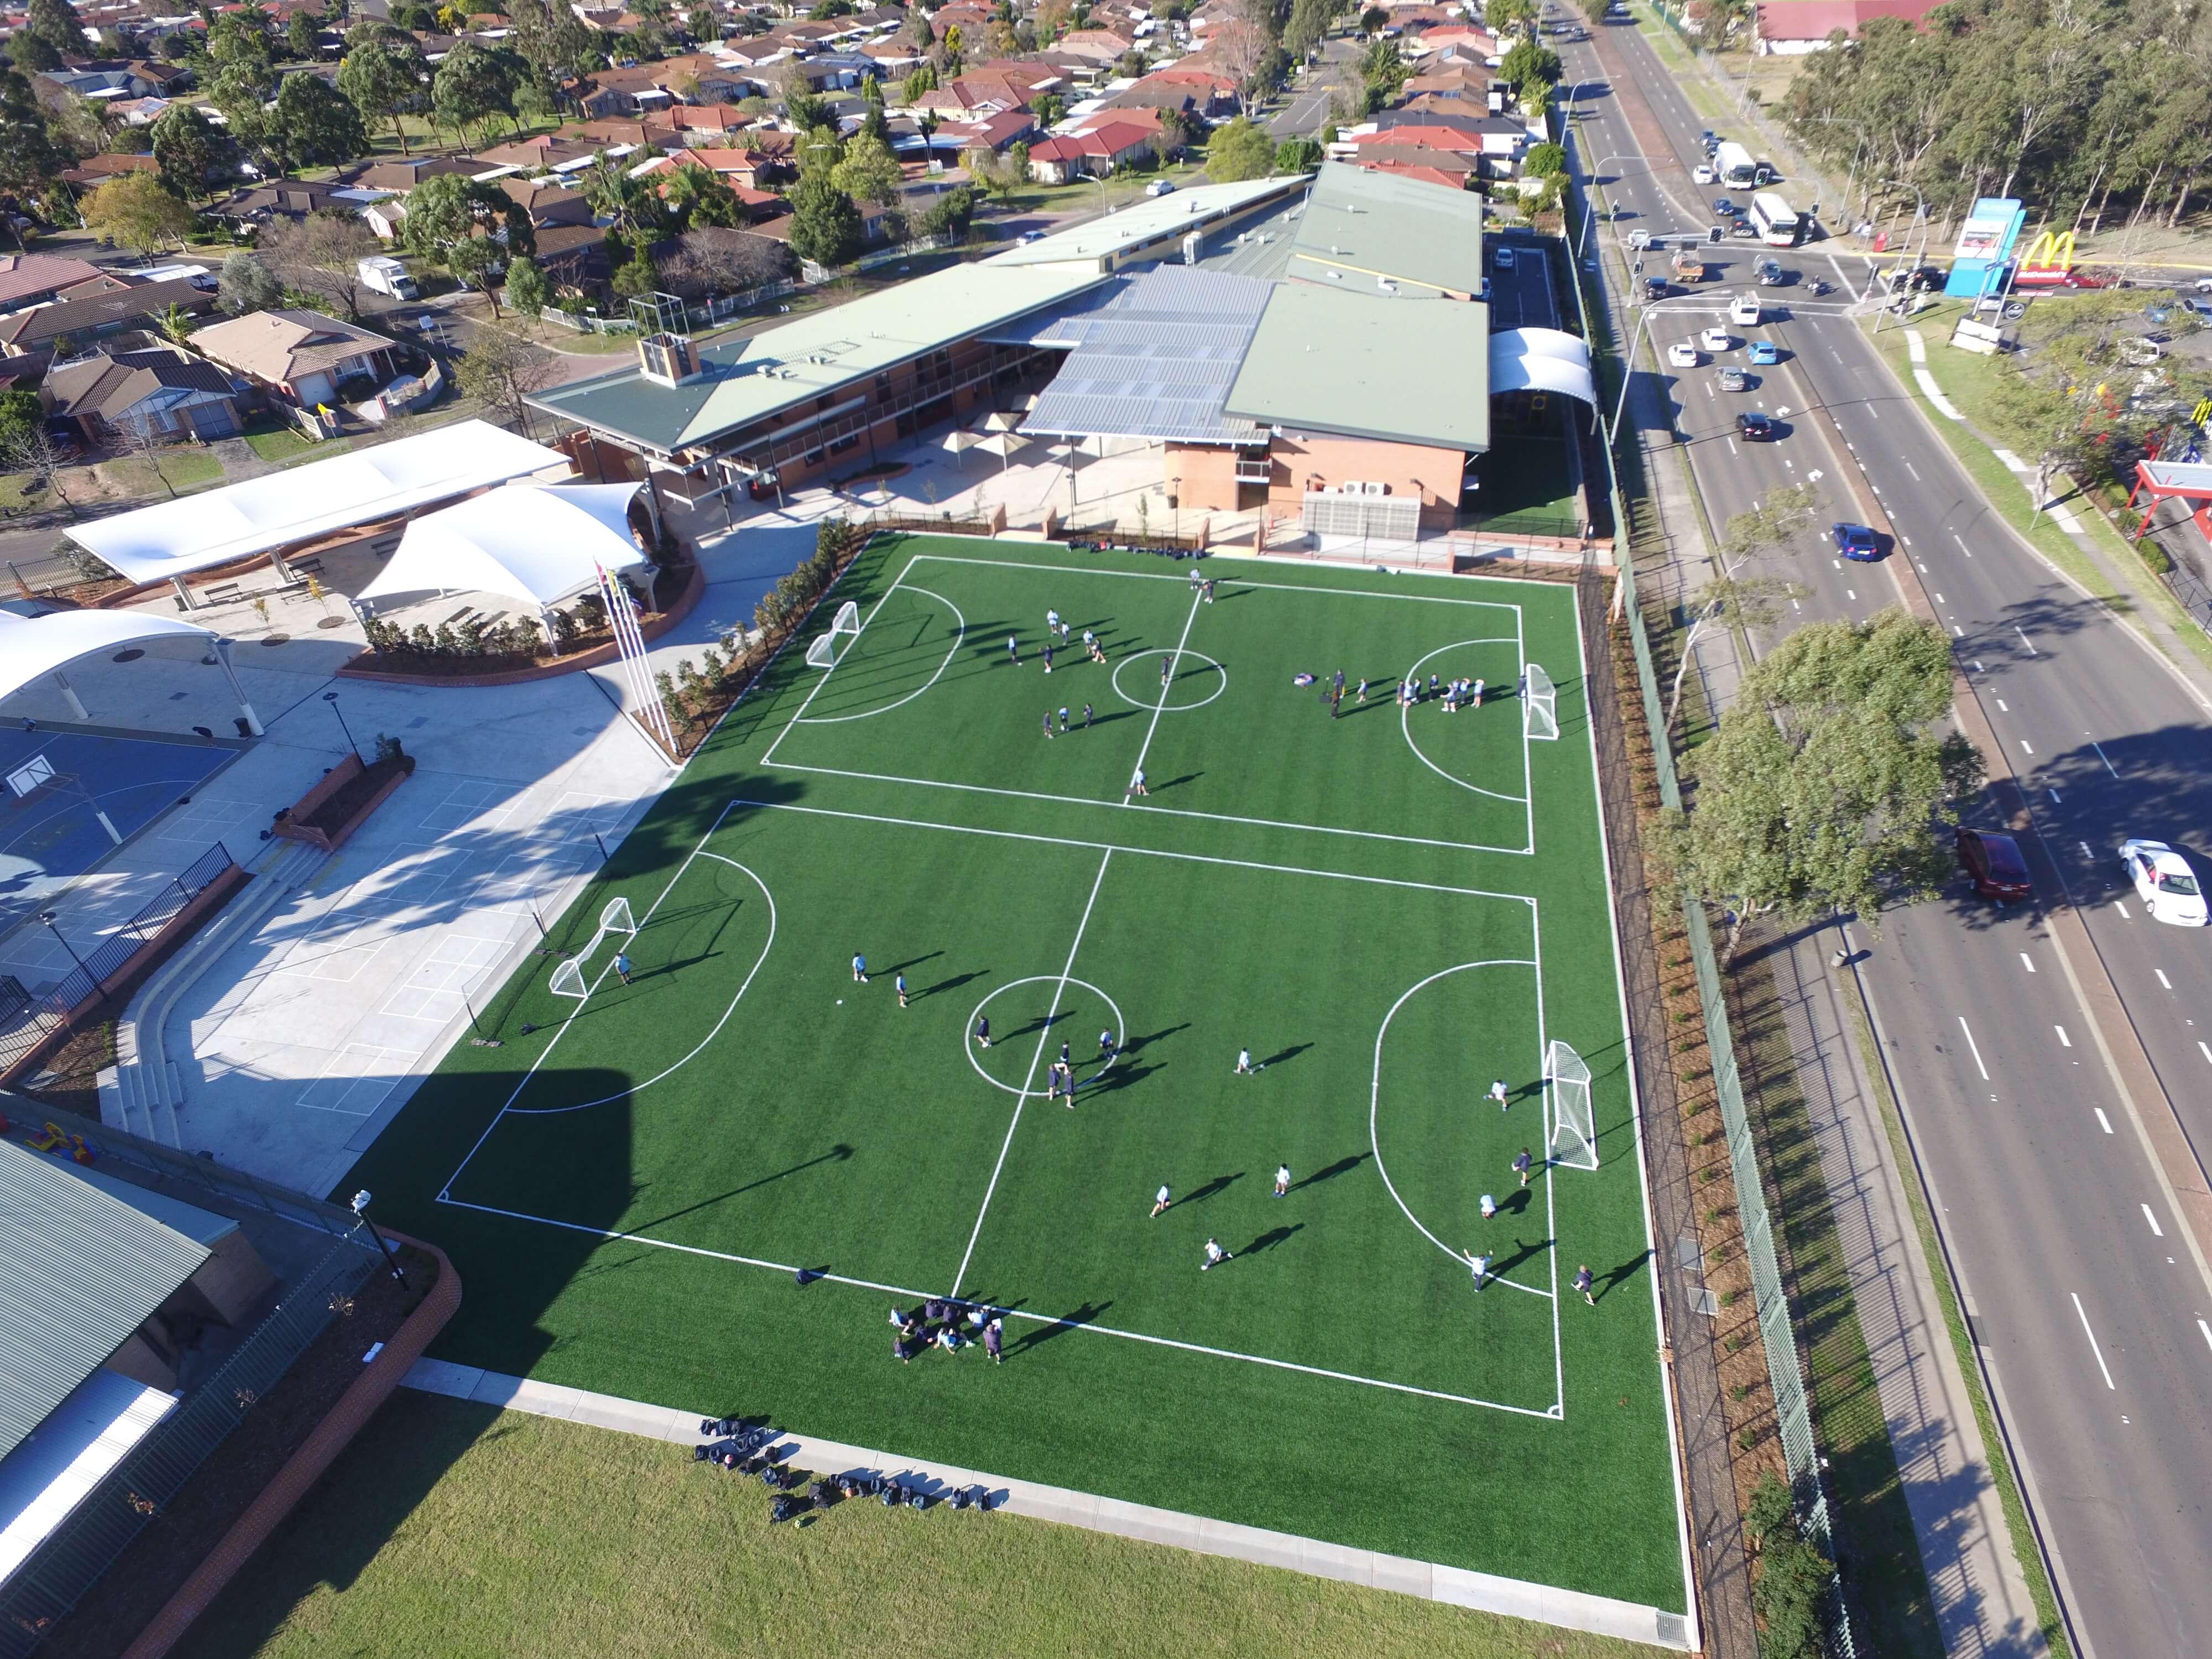 Drone view of RJ Anglican School Futsal Court